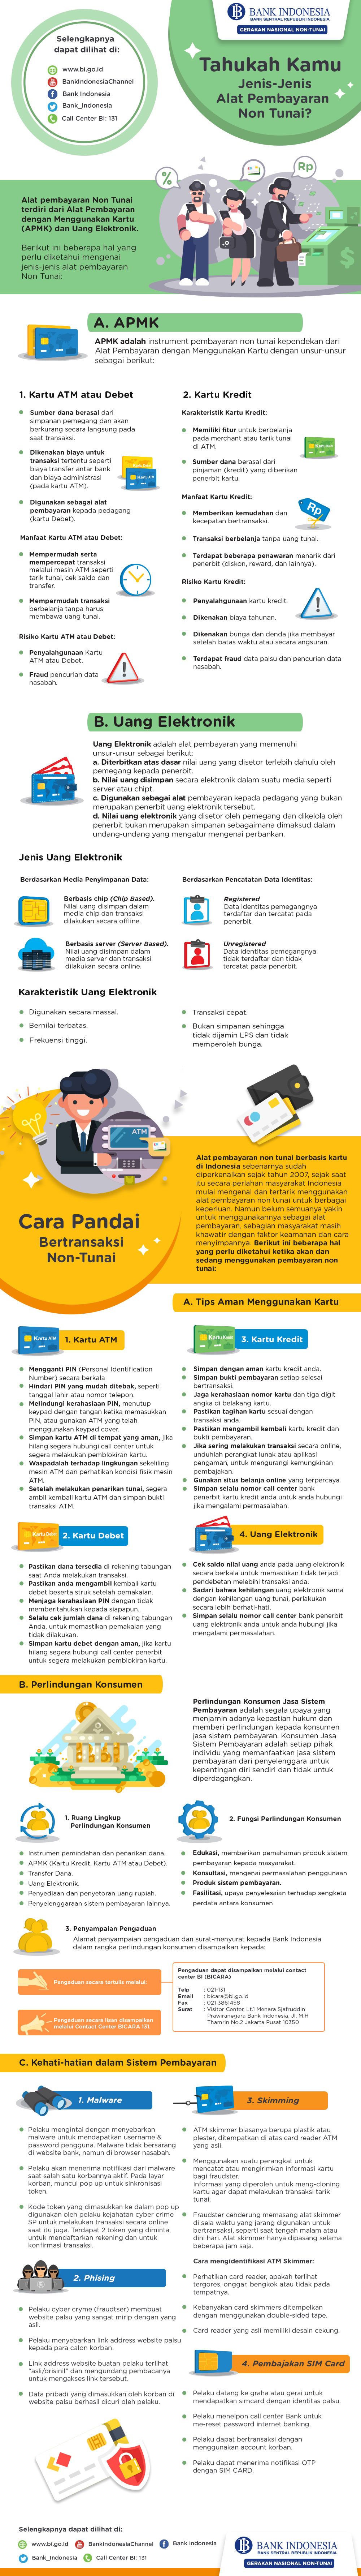 infografis BI GTC